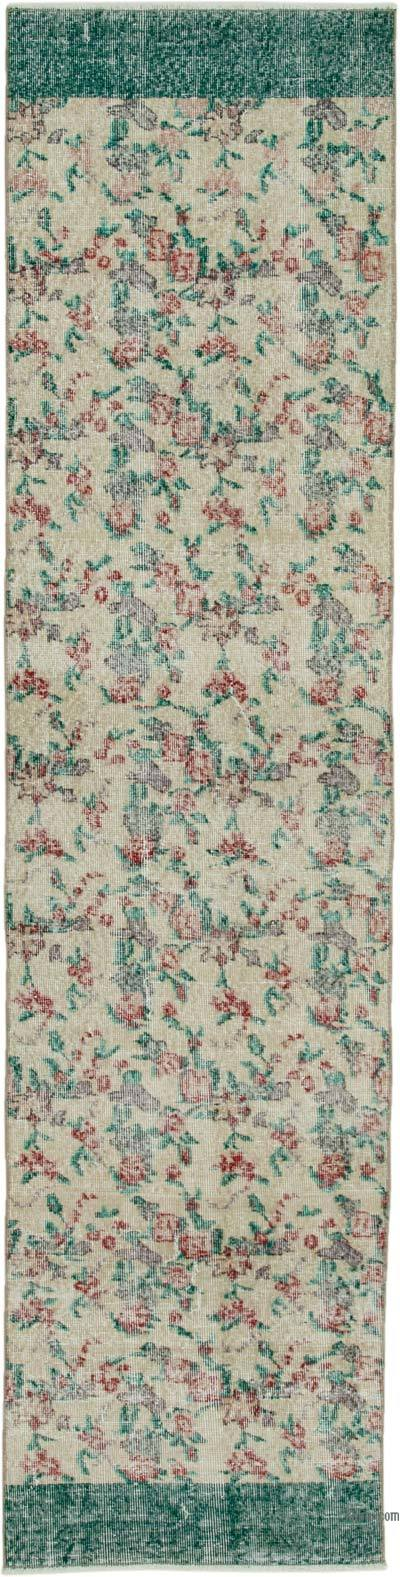 Alfombra Turca Vintage De Pasillo - 72 cm x 297 cm